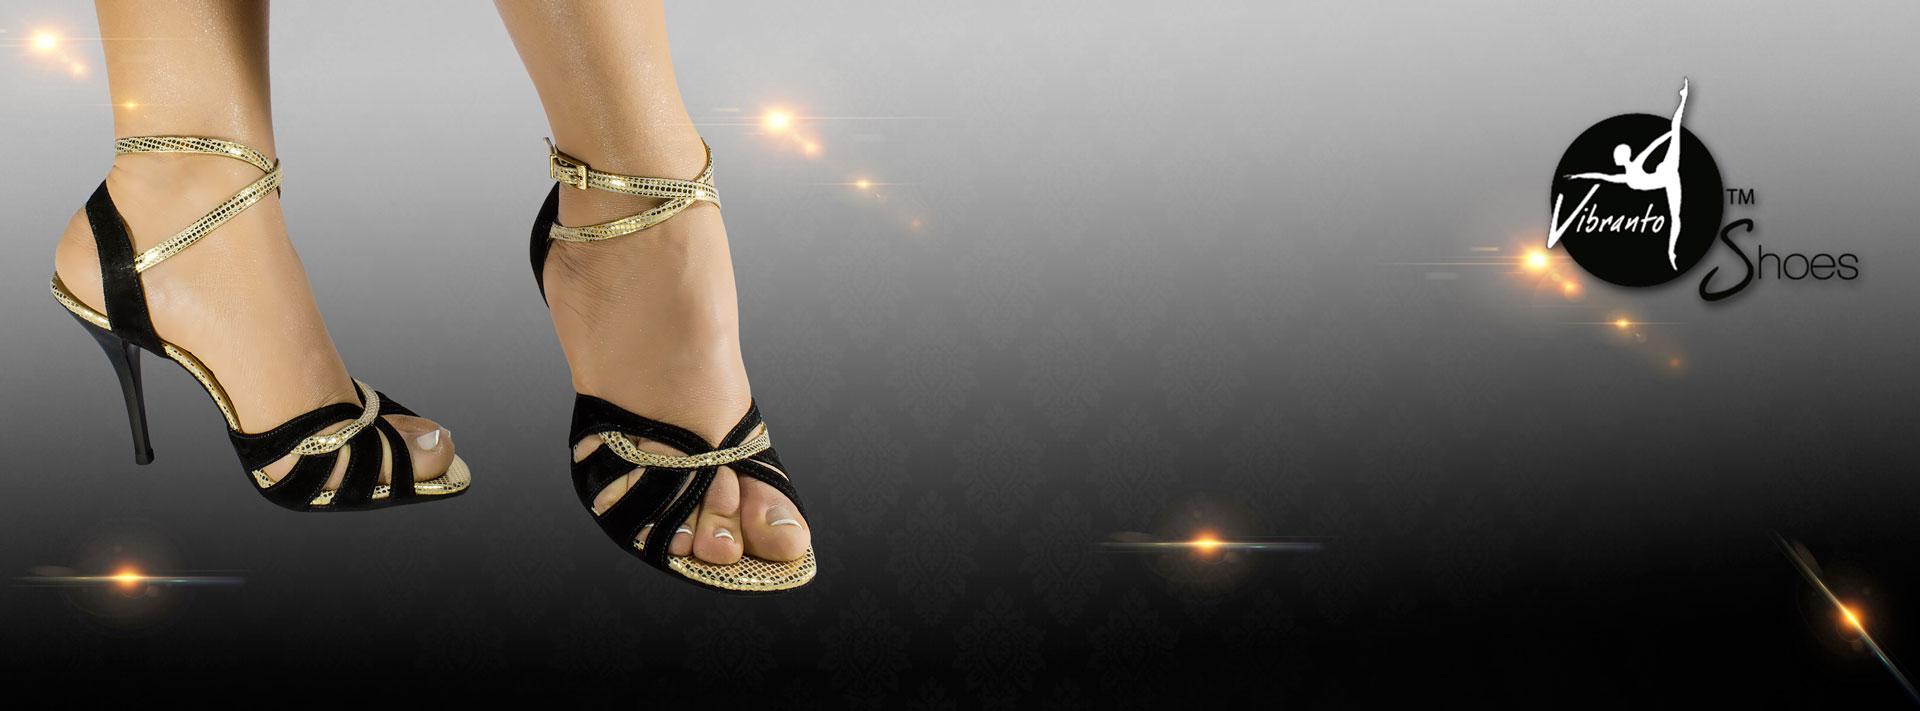 Vibranto Shoes banner